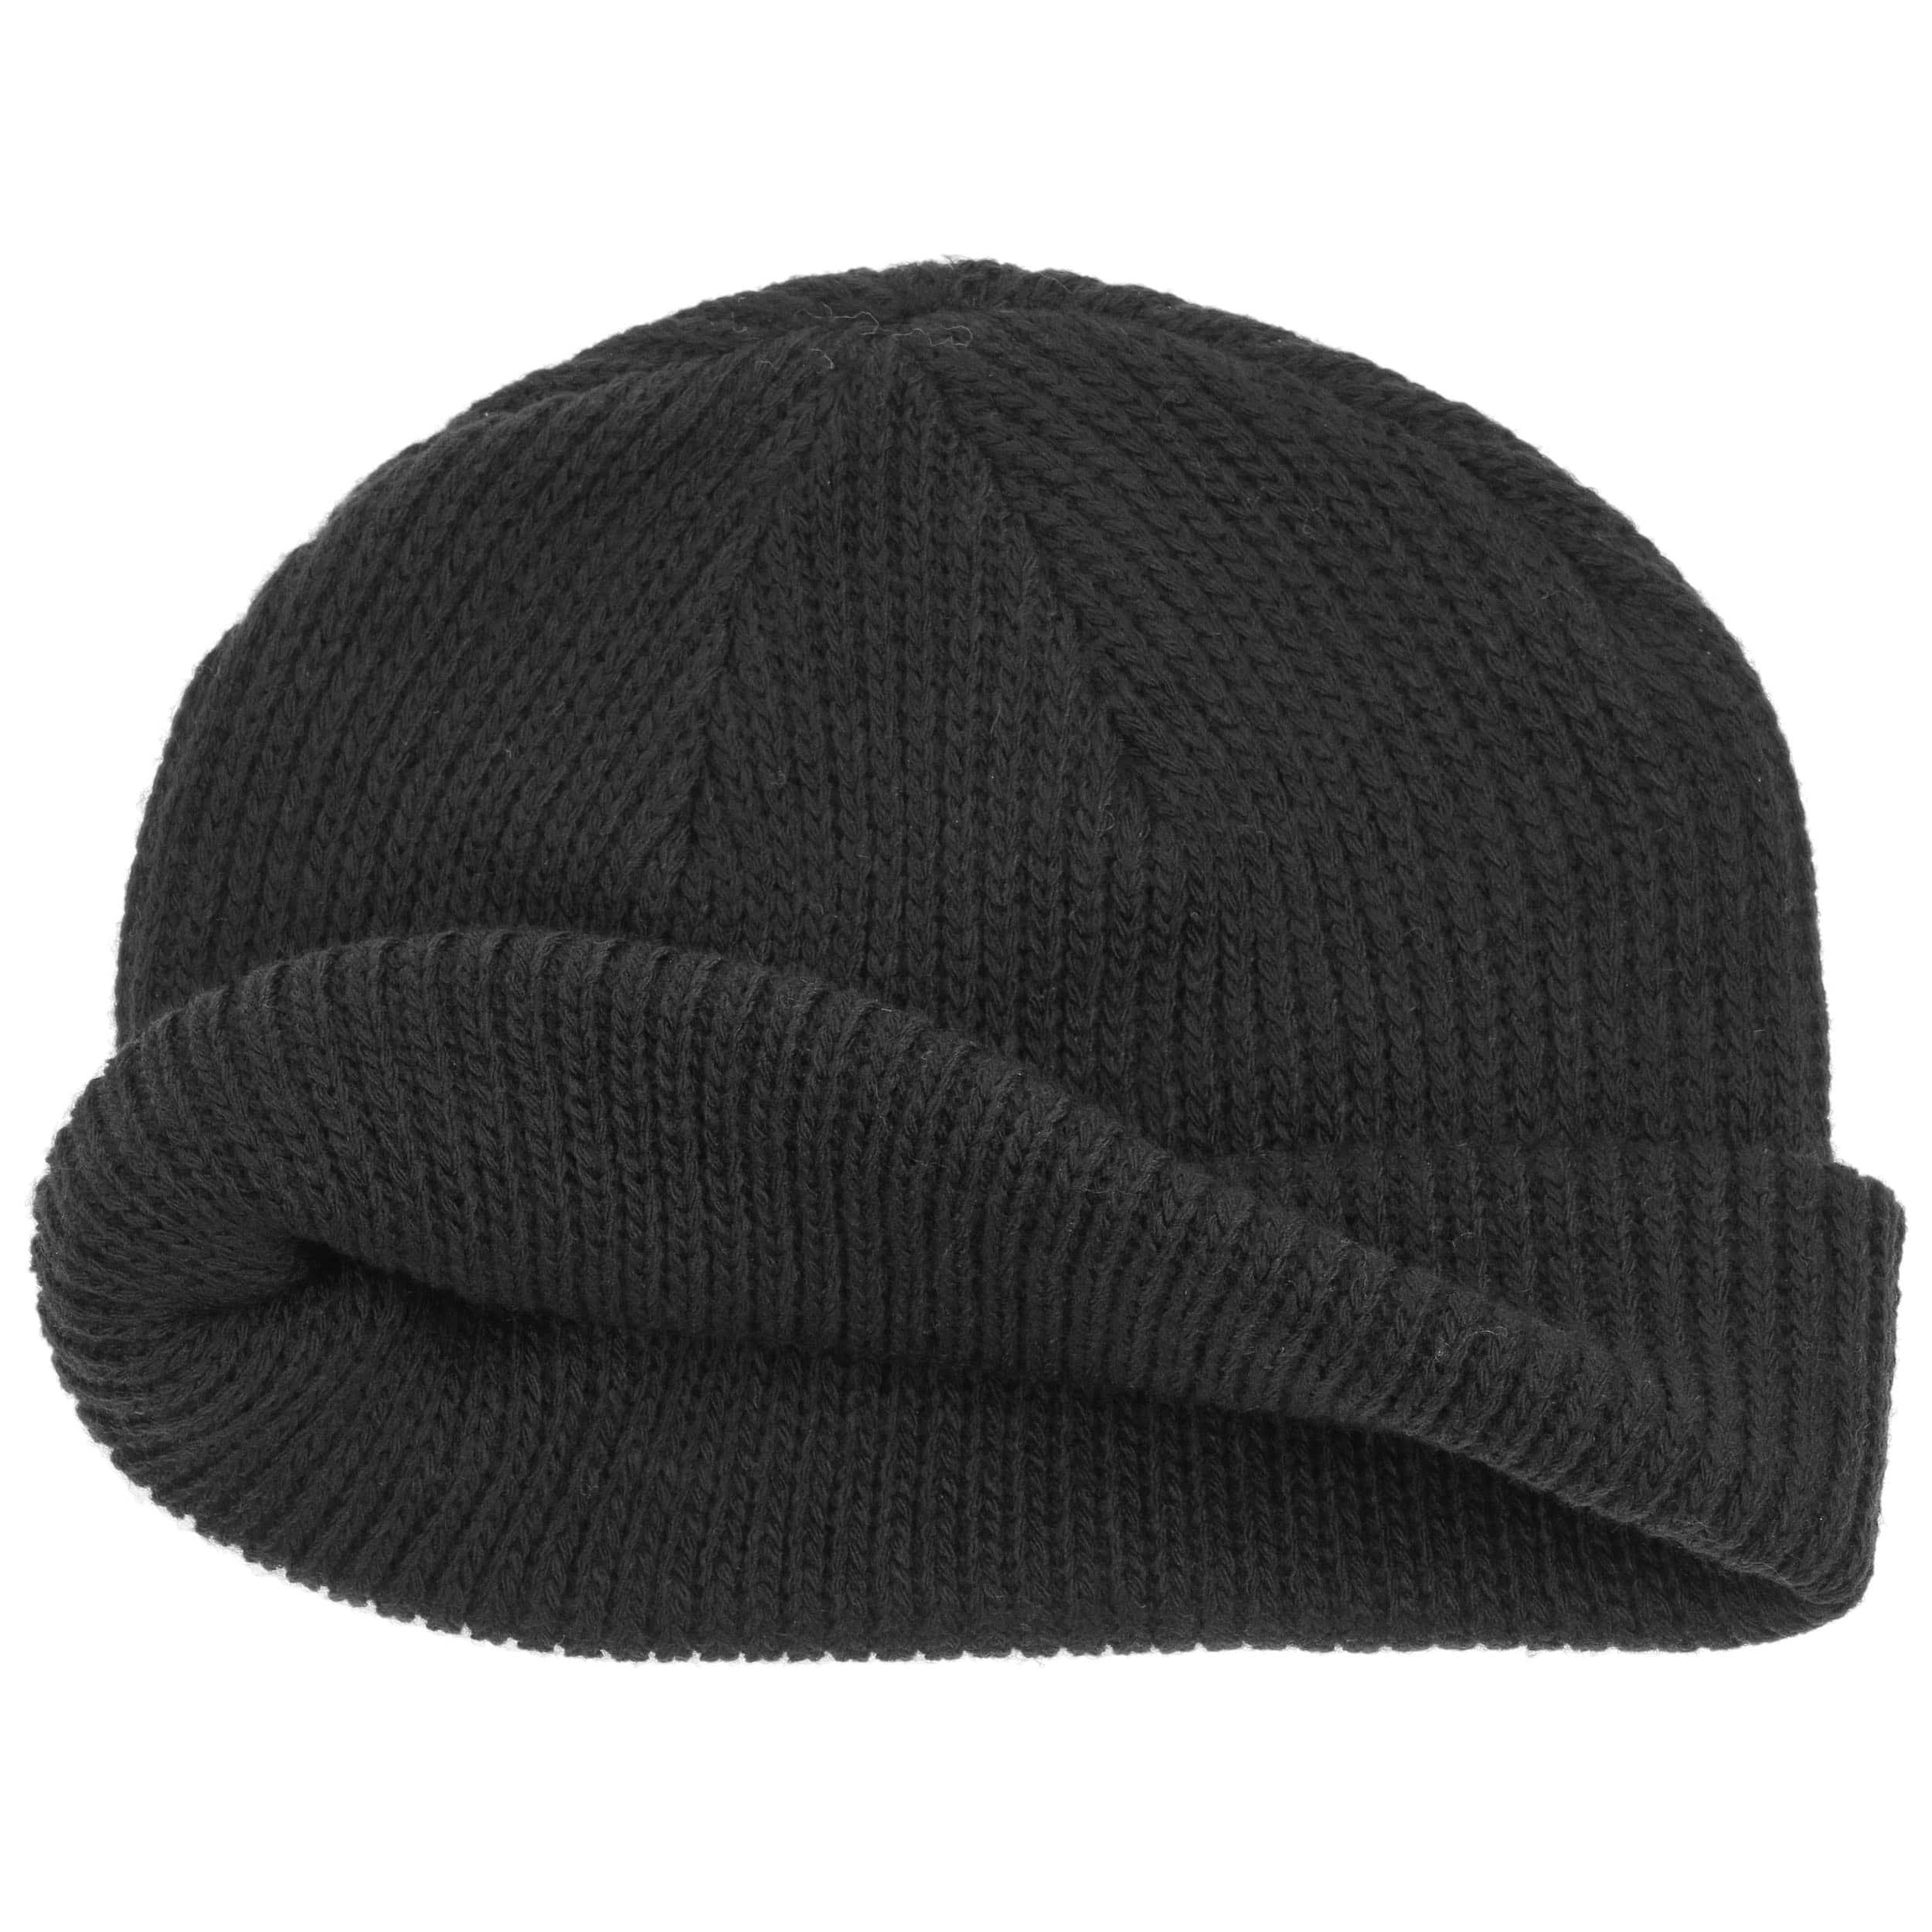 cappello vans nero invernale